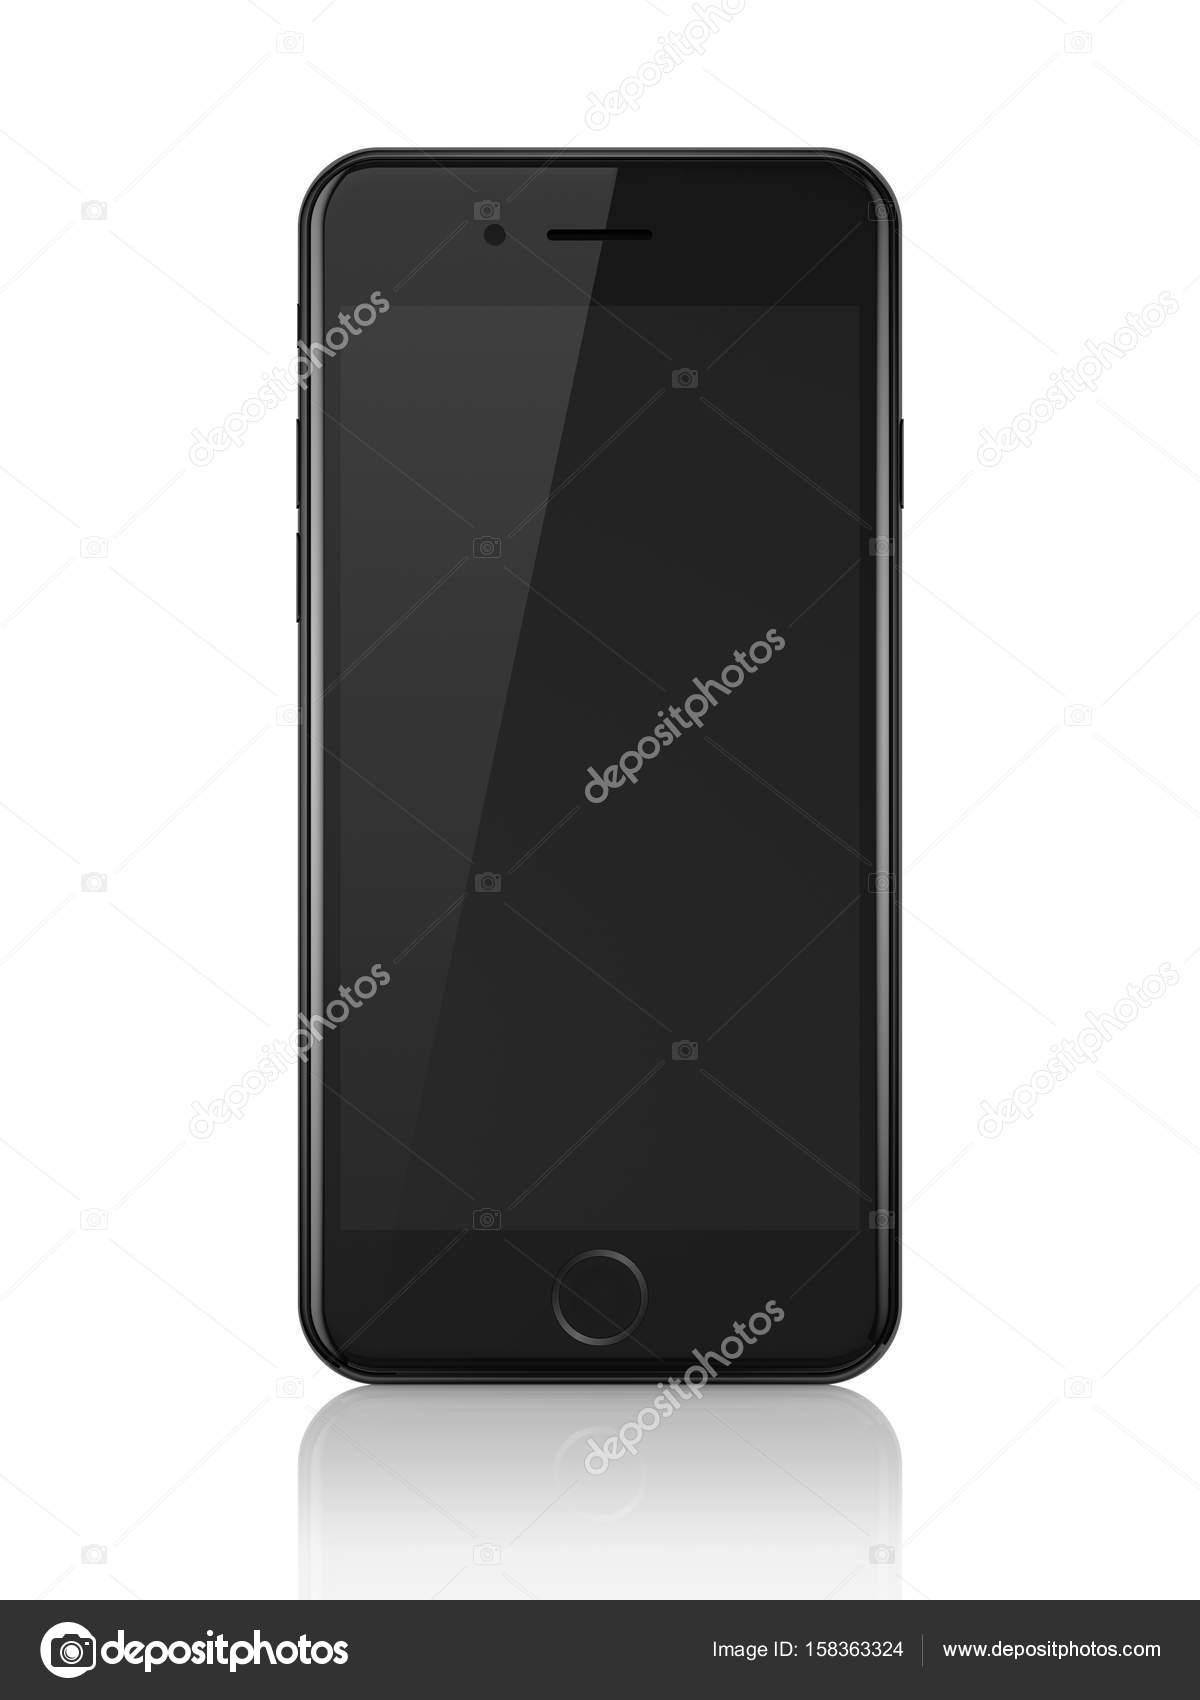 MINSK, BELARUS - JUNE 26, 2017: black iPhone 7 with blank